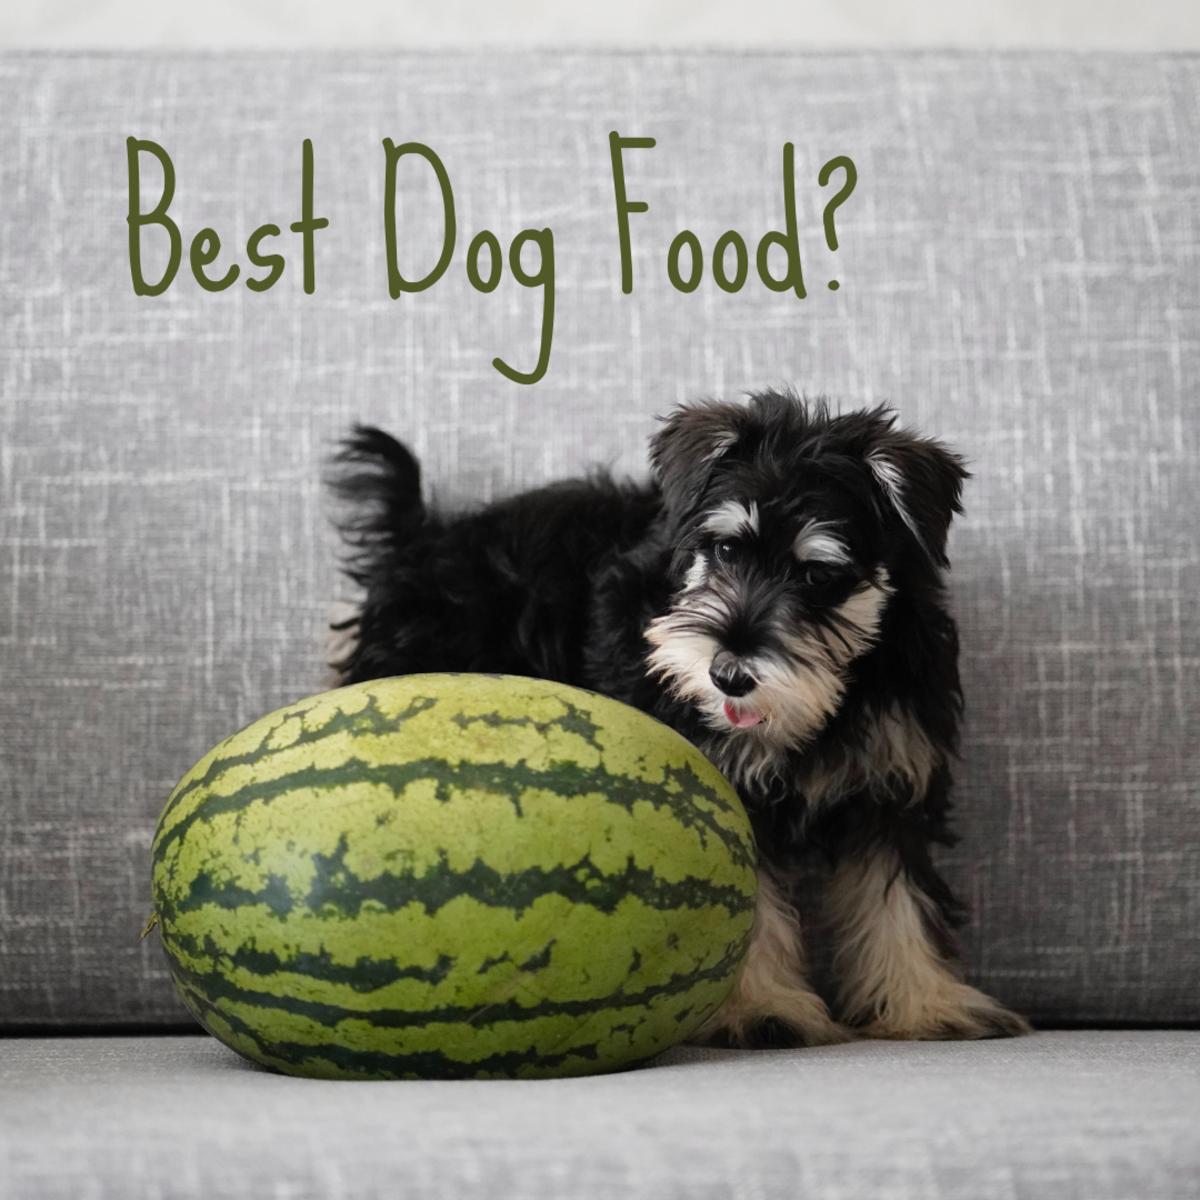 10-best-dog-food-2